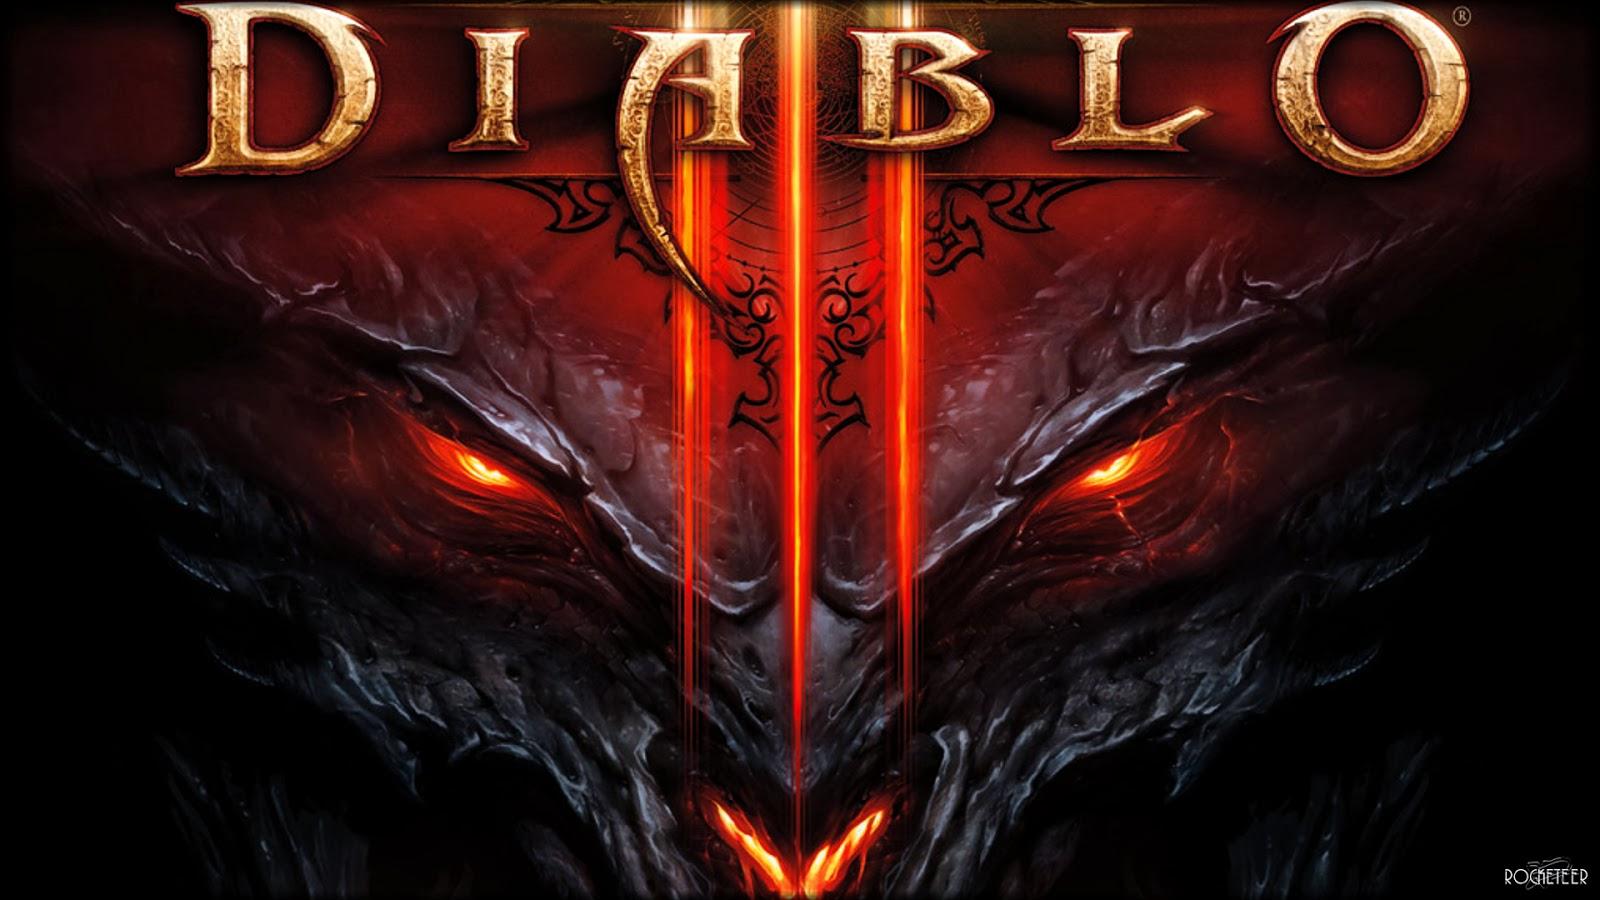 diablo 3 free download full game mac